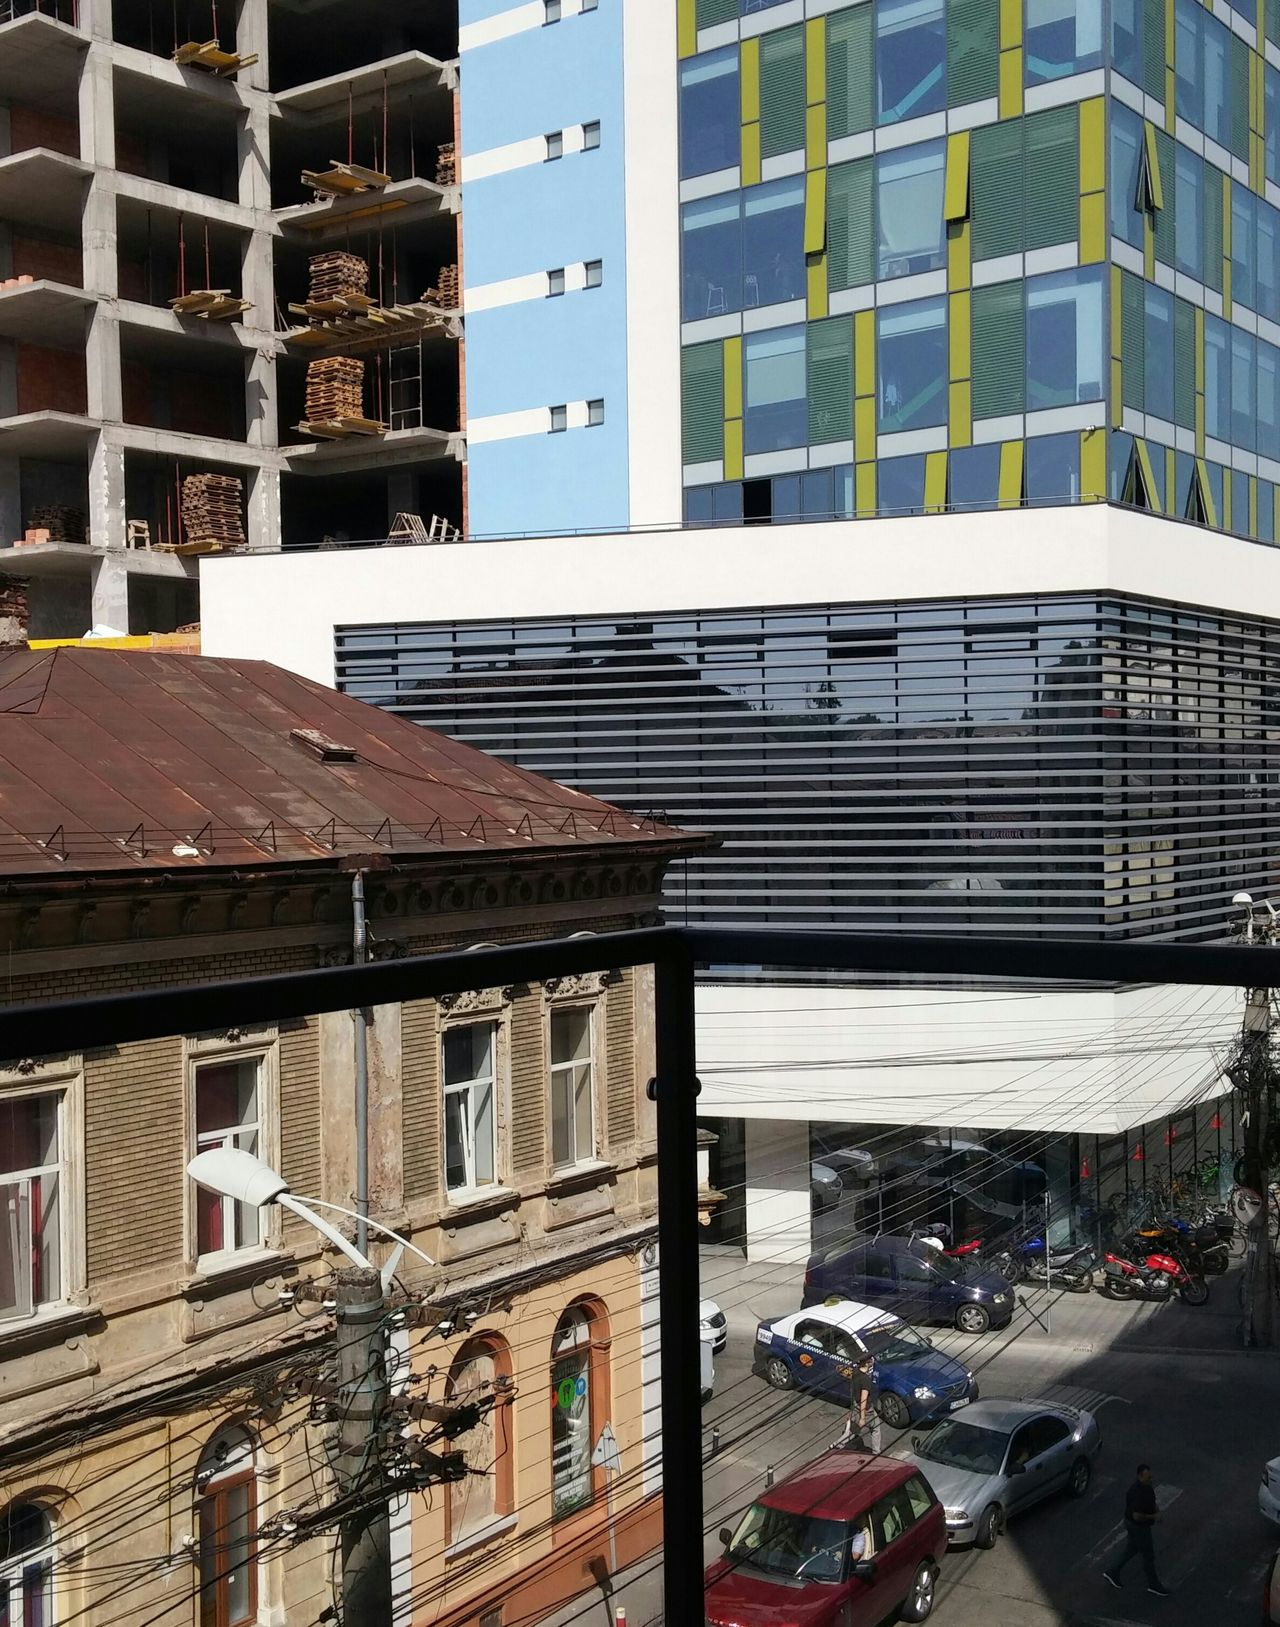 Cluj Kolozsvár Streetphotography Streetlife Buildings LGg3photography Mobilephotography Moment